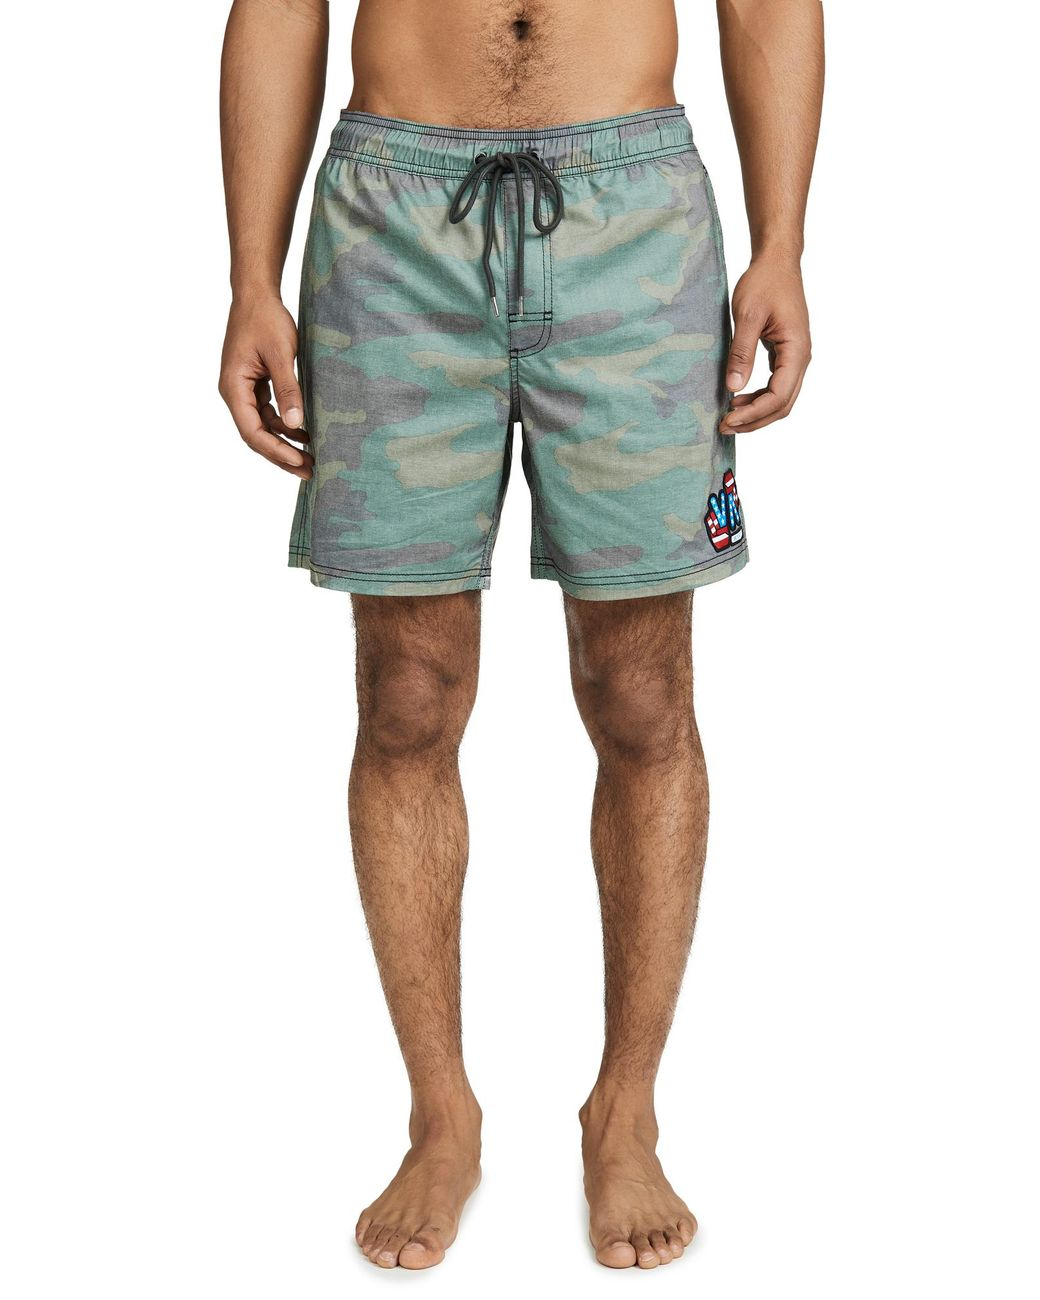 fa03144603 RVCA Daytona Camo Swim Shorts for Men - Lyst